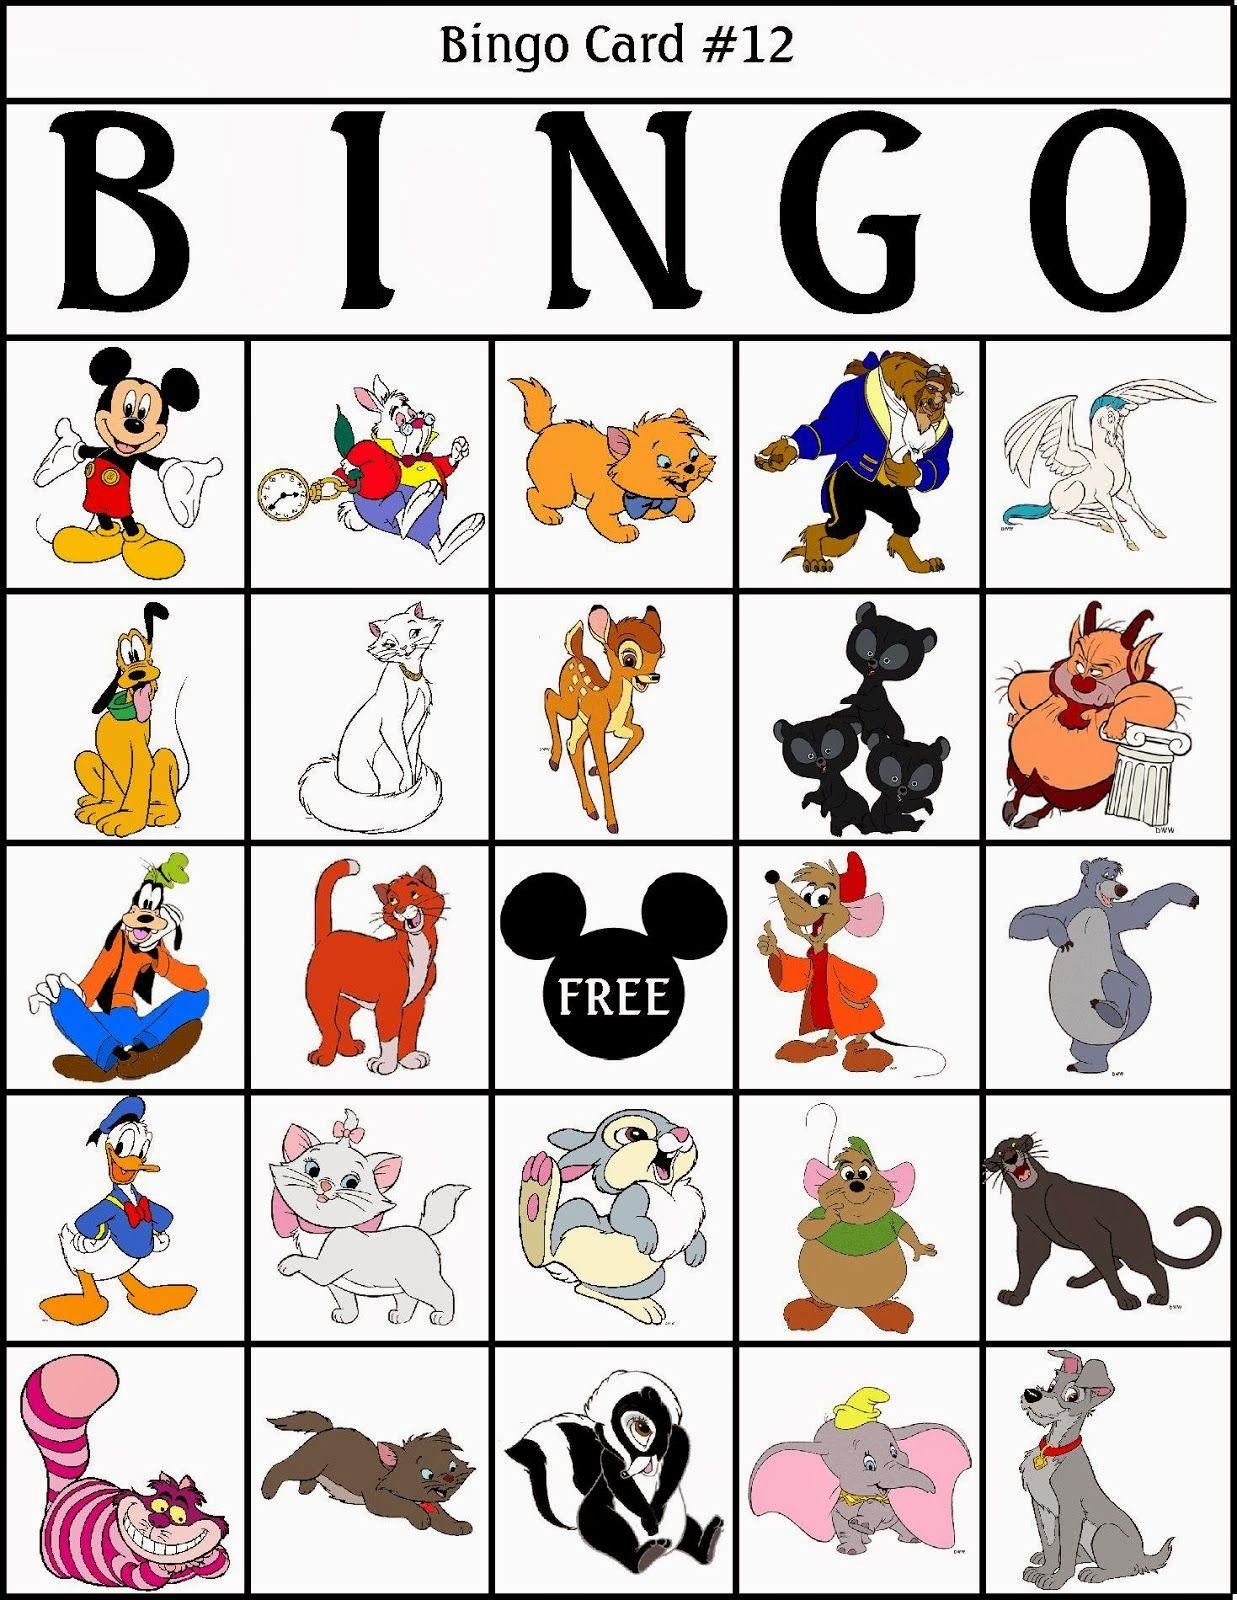 Bingo De Personajes Disney Para Imprimir Gratis Bingo